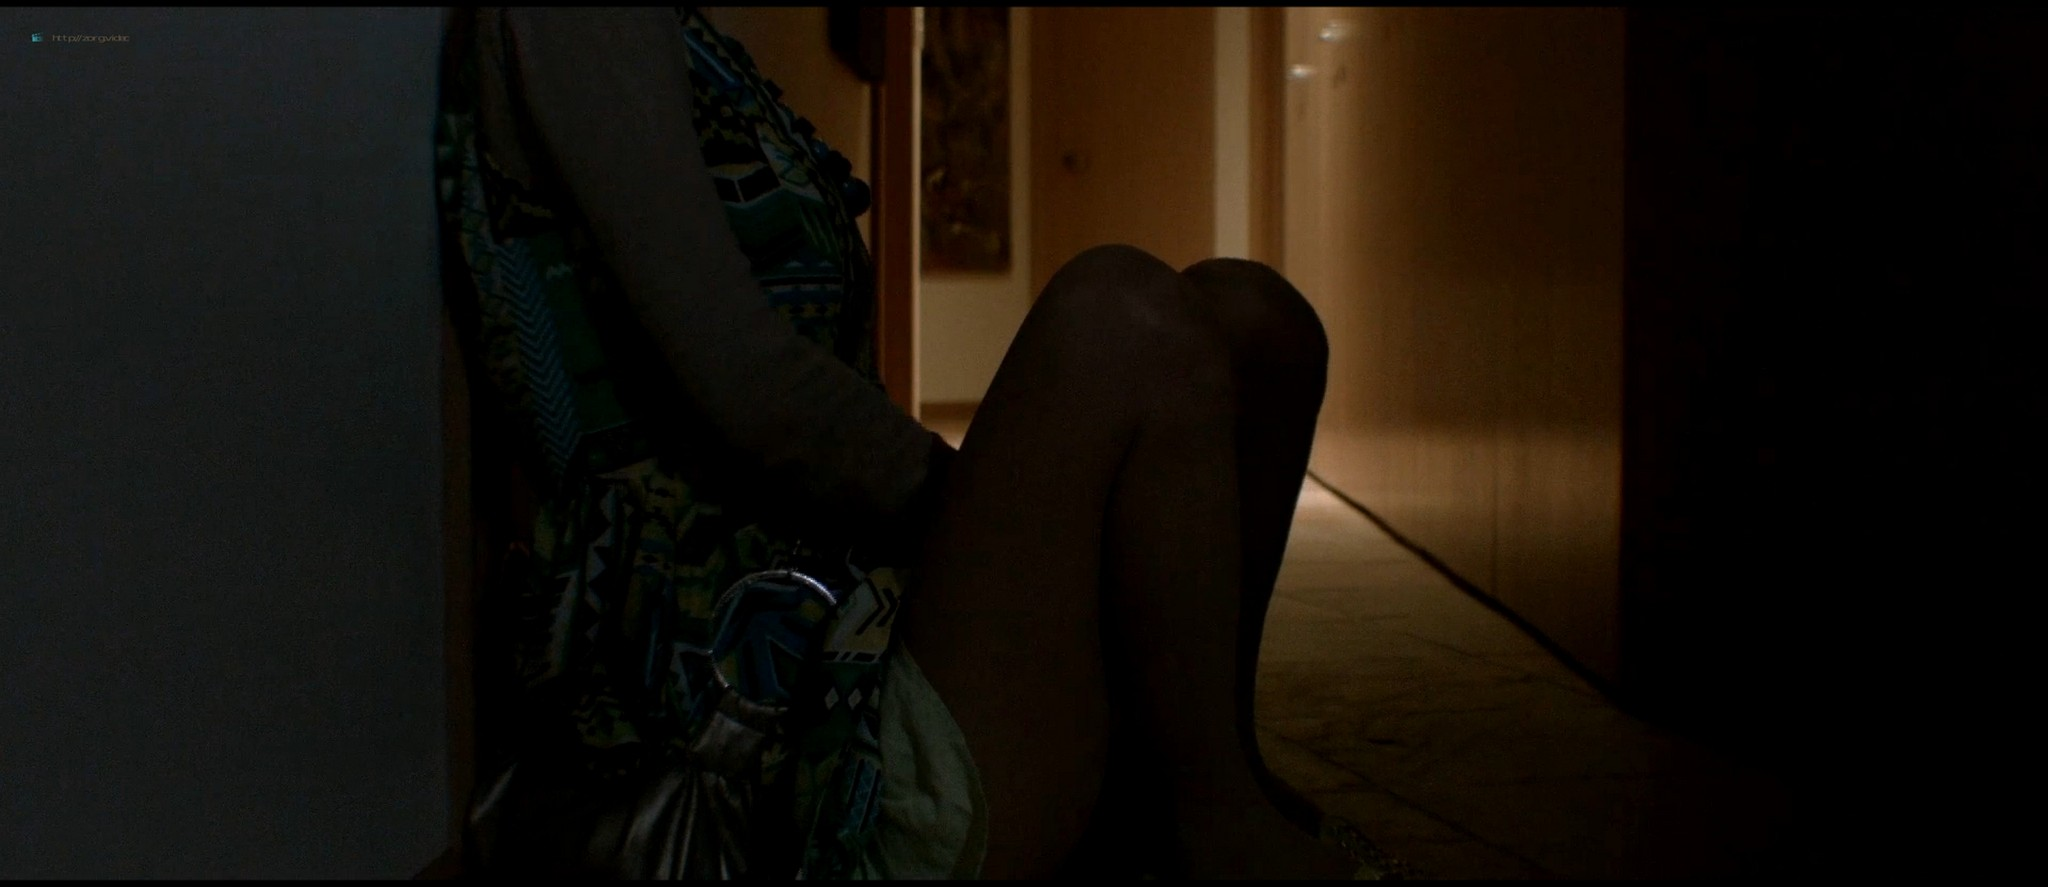 Saara Lamberg nude Jenni Mitchell, April Garreffa nude too - Innuendo (2017) HD 1080p Web (5)